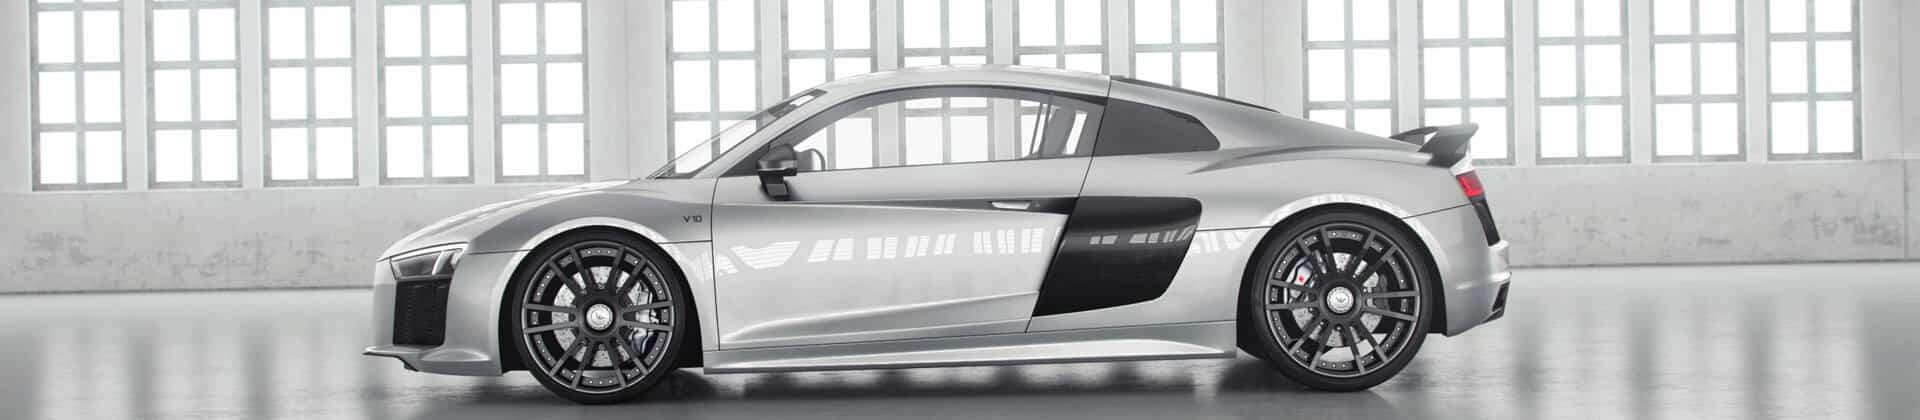 motortuning v10 Audi R8